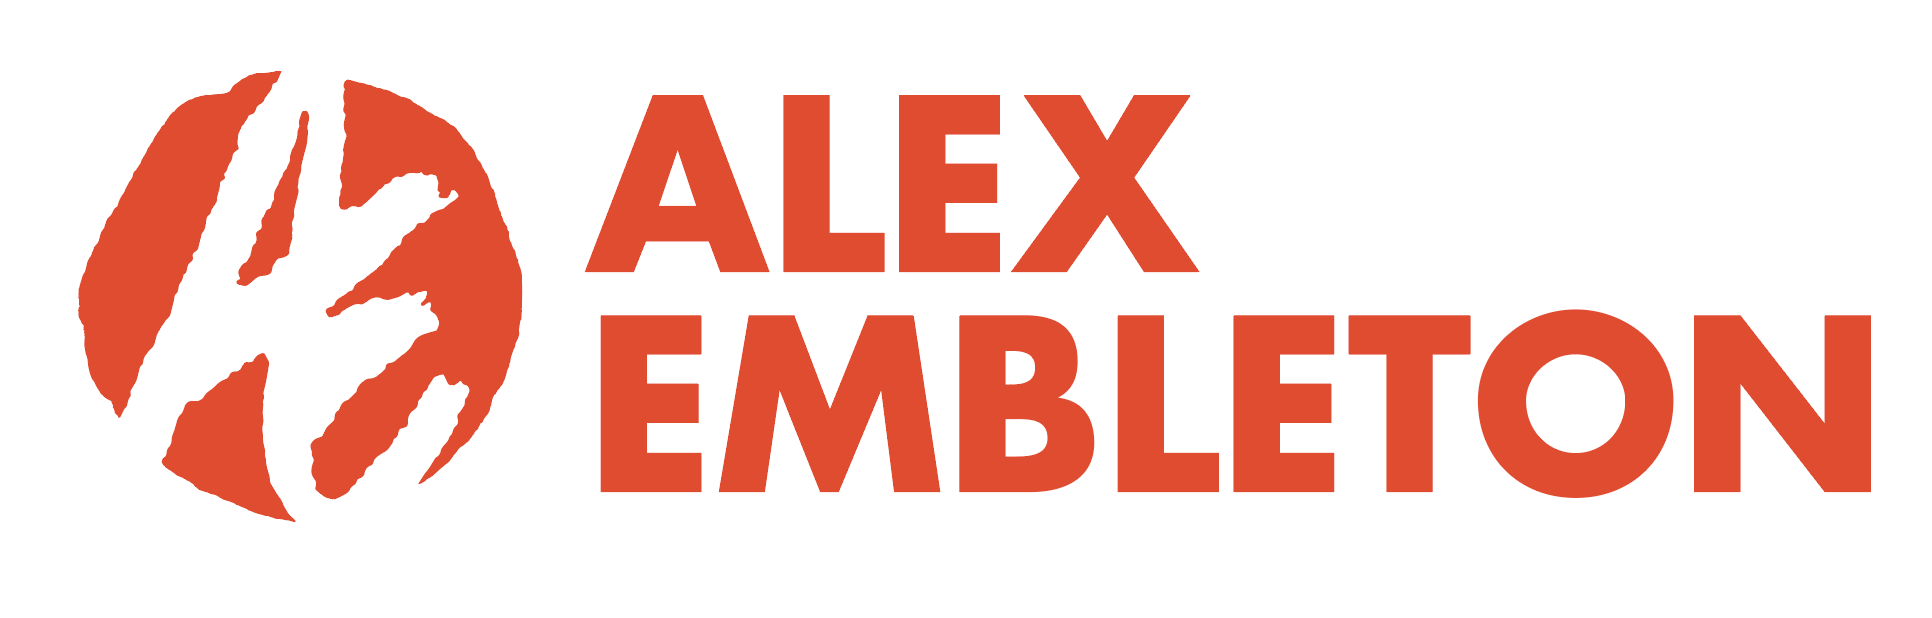 Alexander Embleton